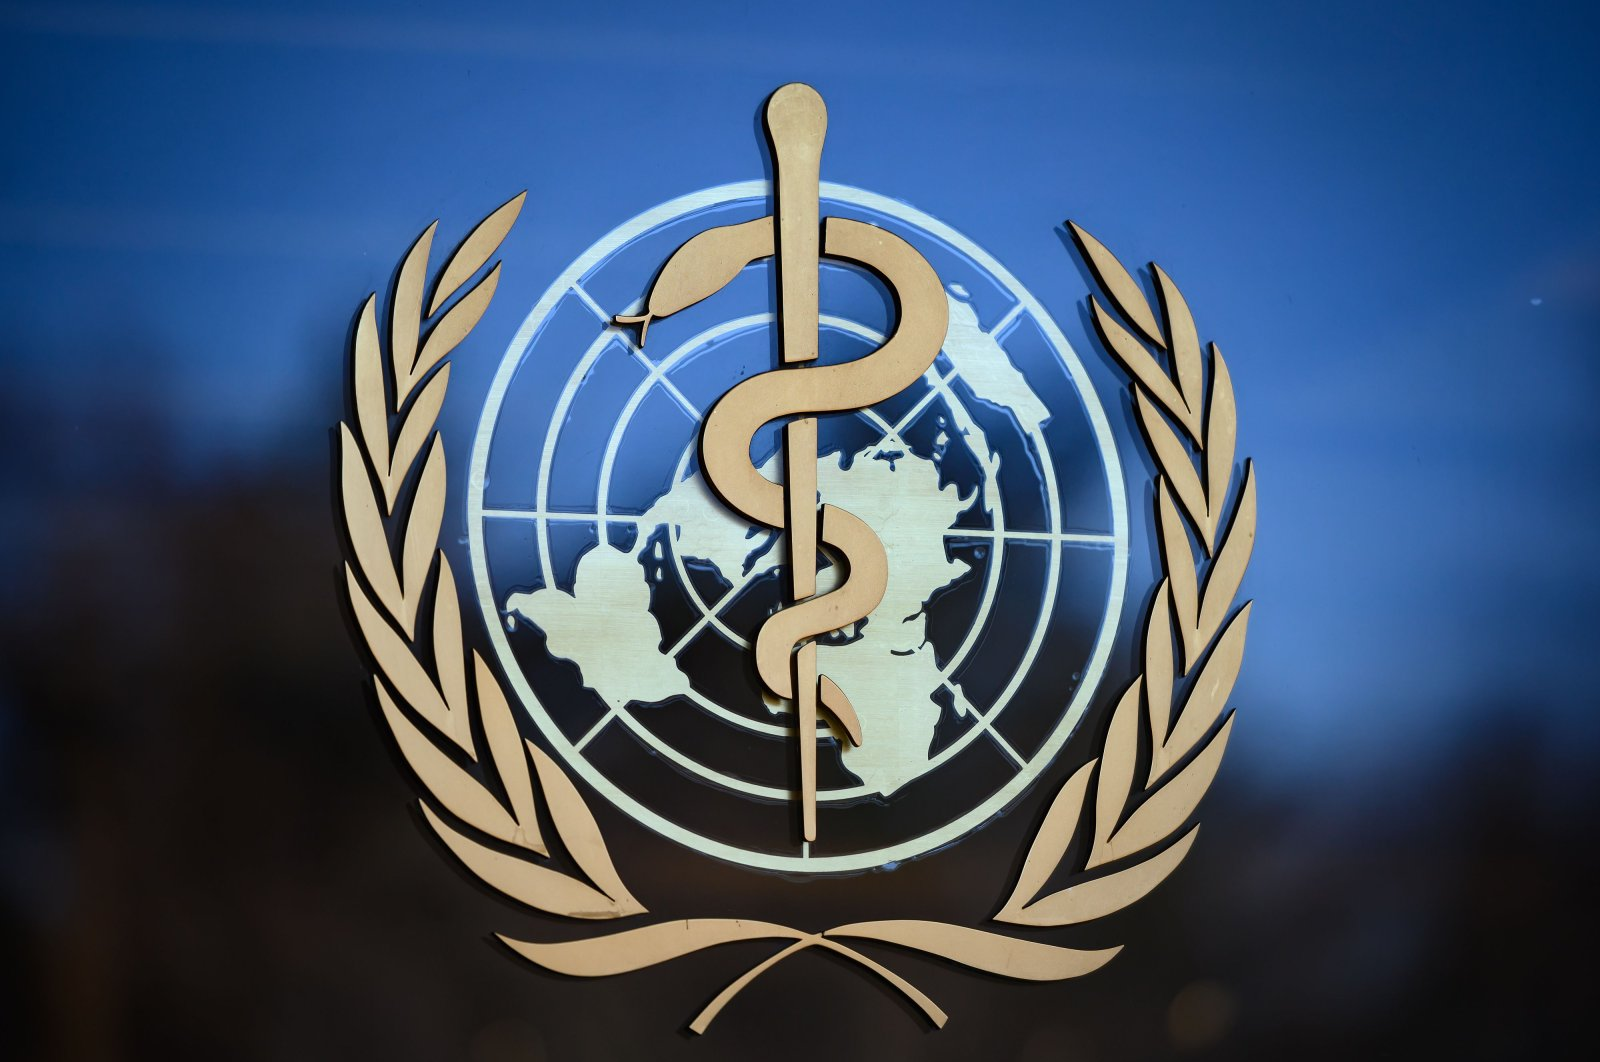 The World Health Organization (WHO) logo seen at its headquarters in Geneva, Switzerland, Feb. 24, 2020. (AFP Photo)